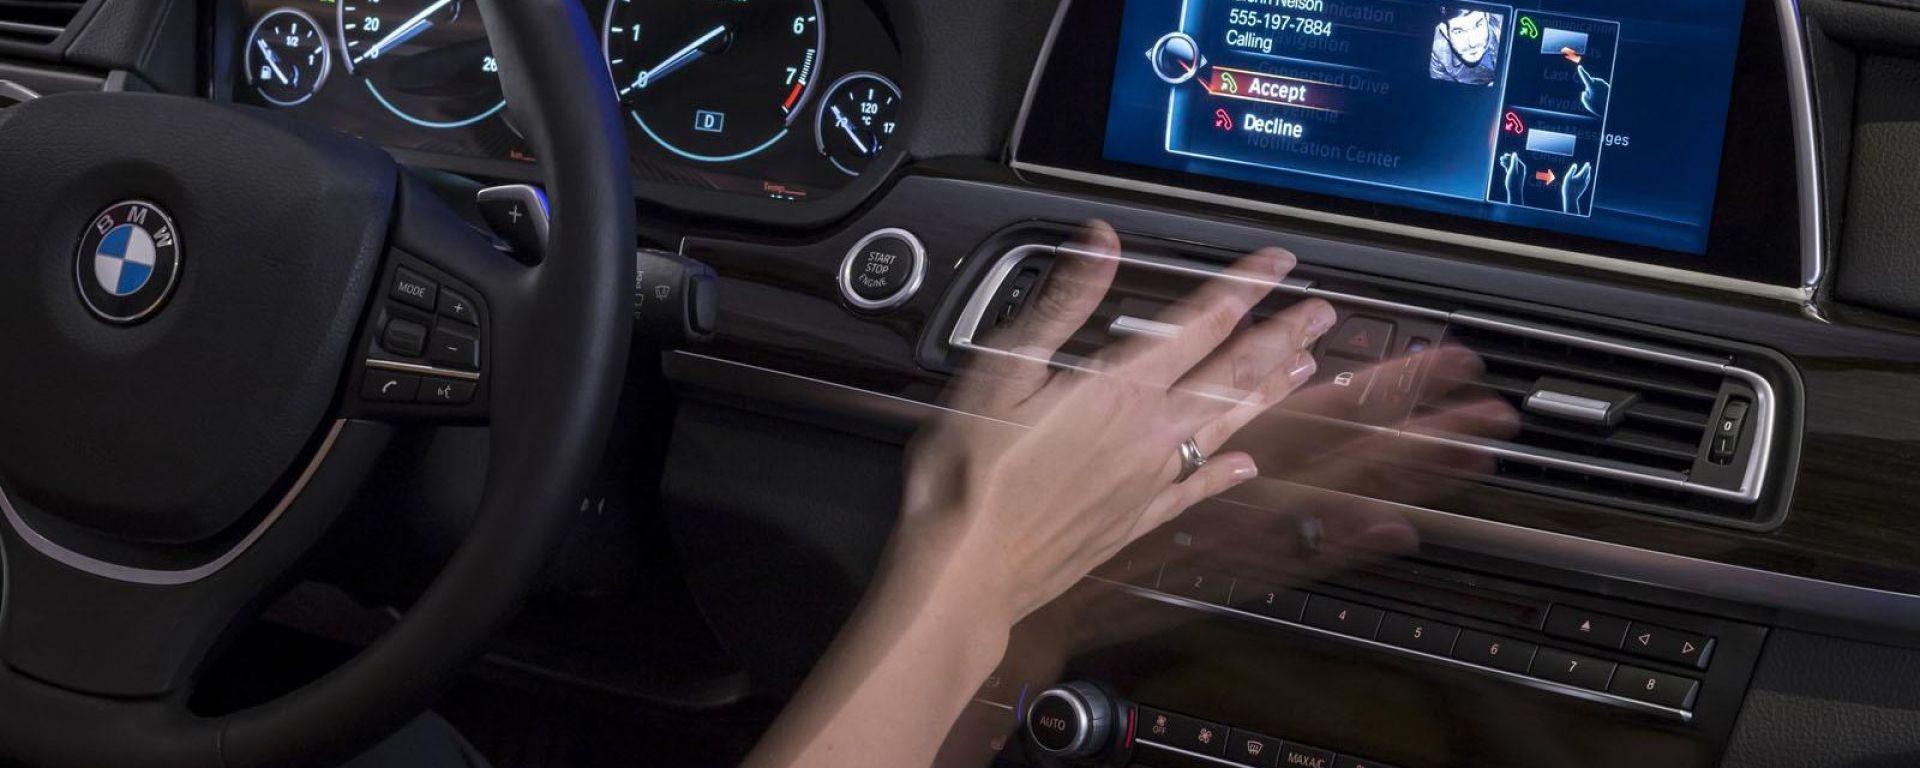 BMW iDrive & TouchCommand